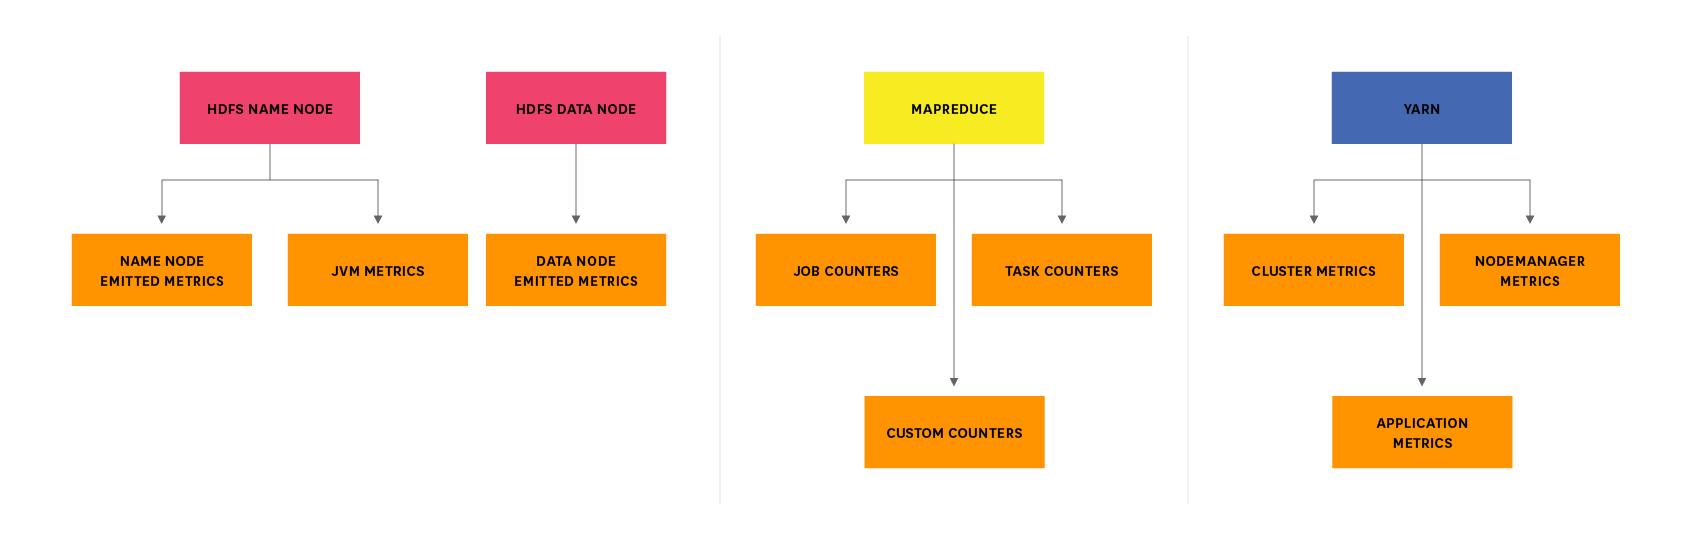 hight resolution of hadoop metrics breakdown diagram